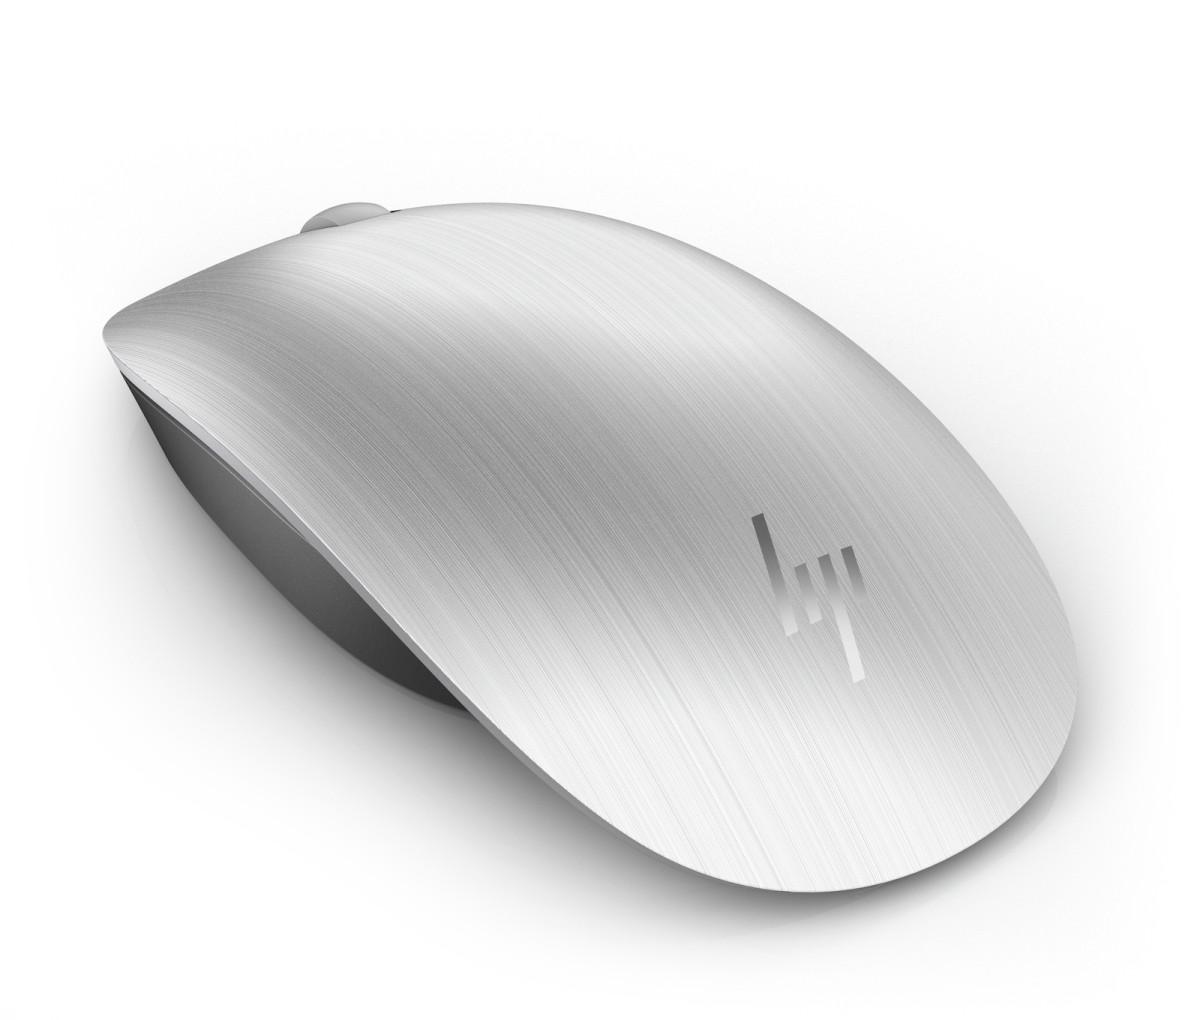 HP myš Spectre 500 stříbrná